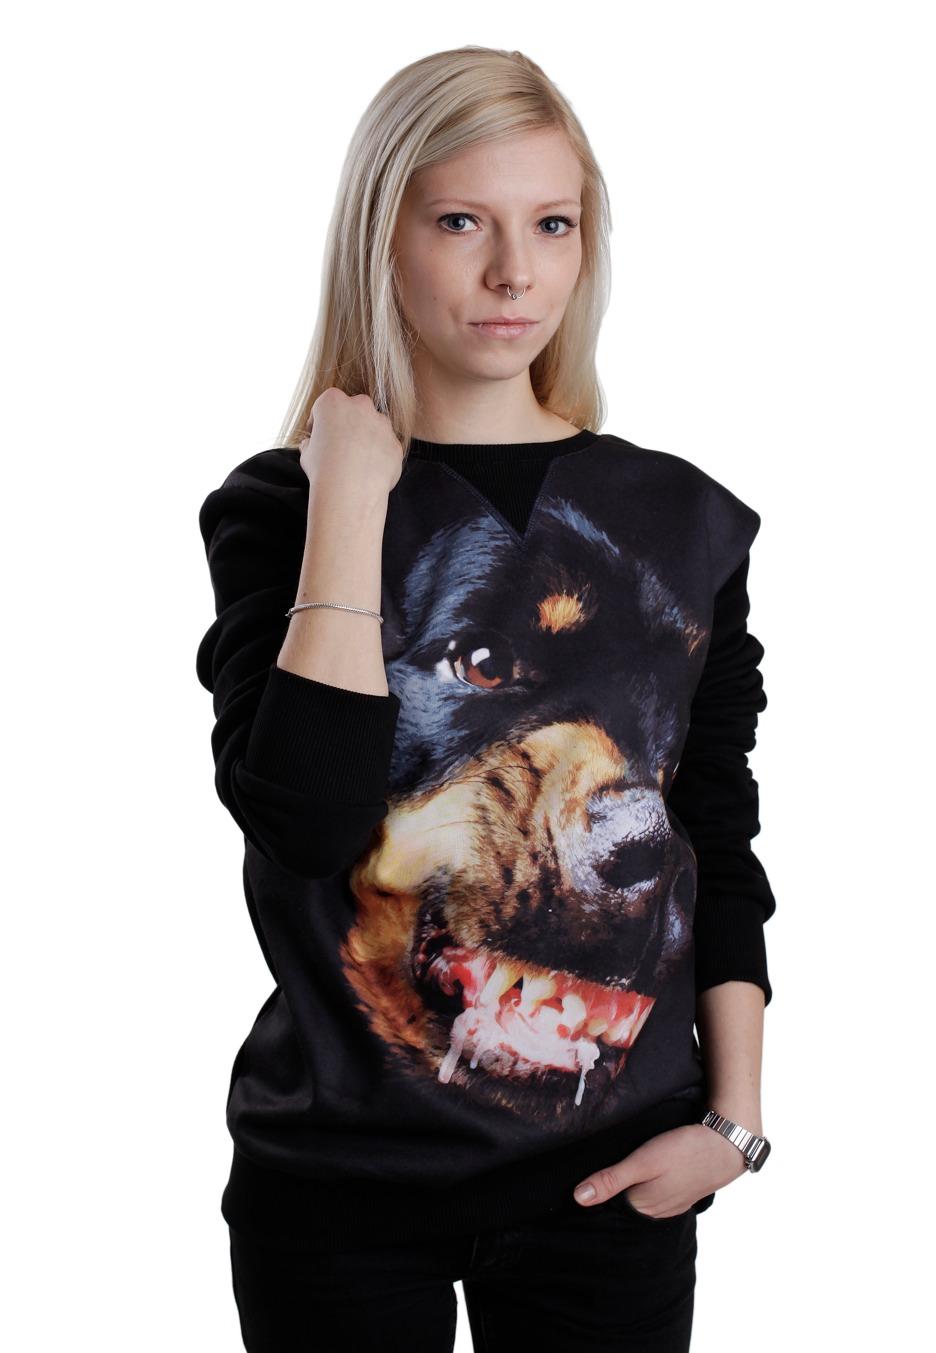 Rottweiler girl SEXY cumshot!